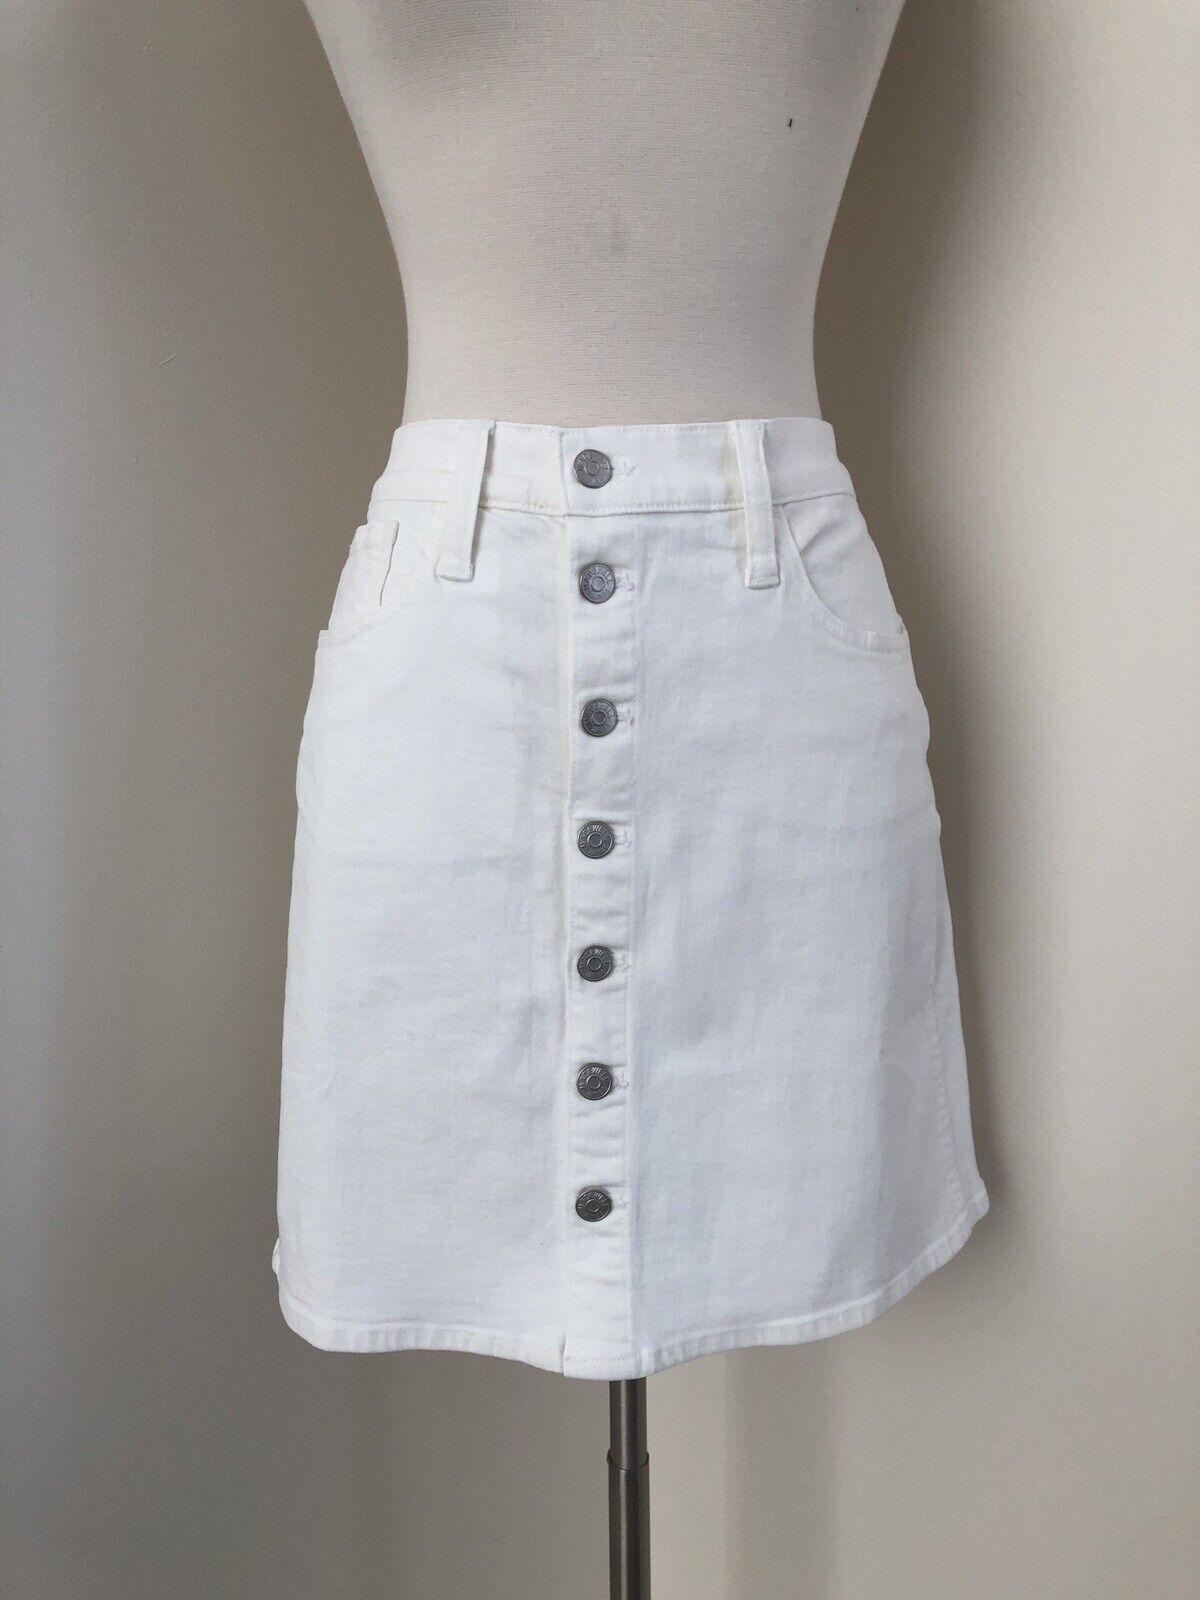 Madewell Stretch Denis Straight Mini kjol Button - Front Edition 29 J0563 vit